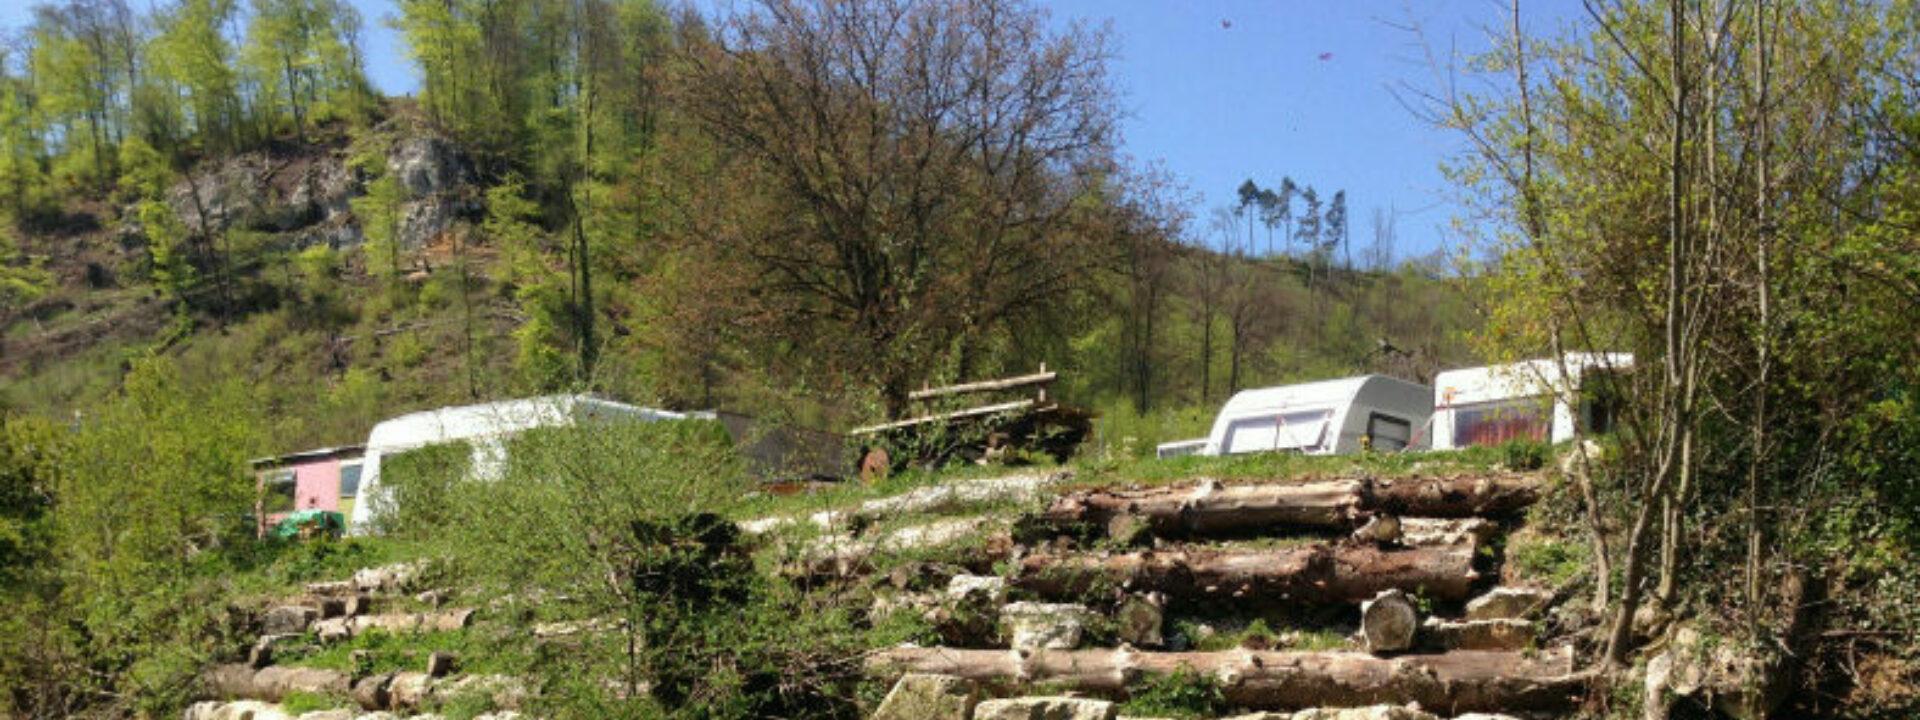 Camping & Wohnmobil